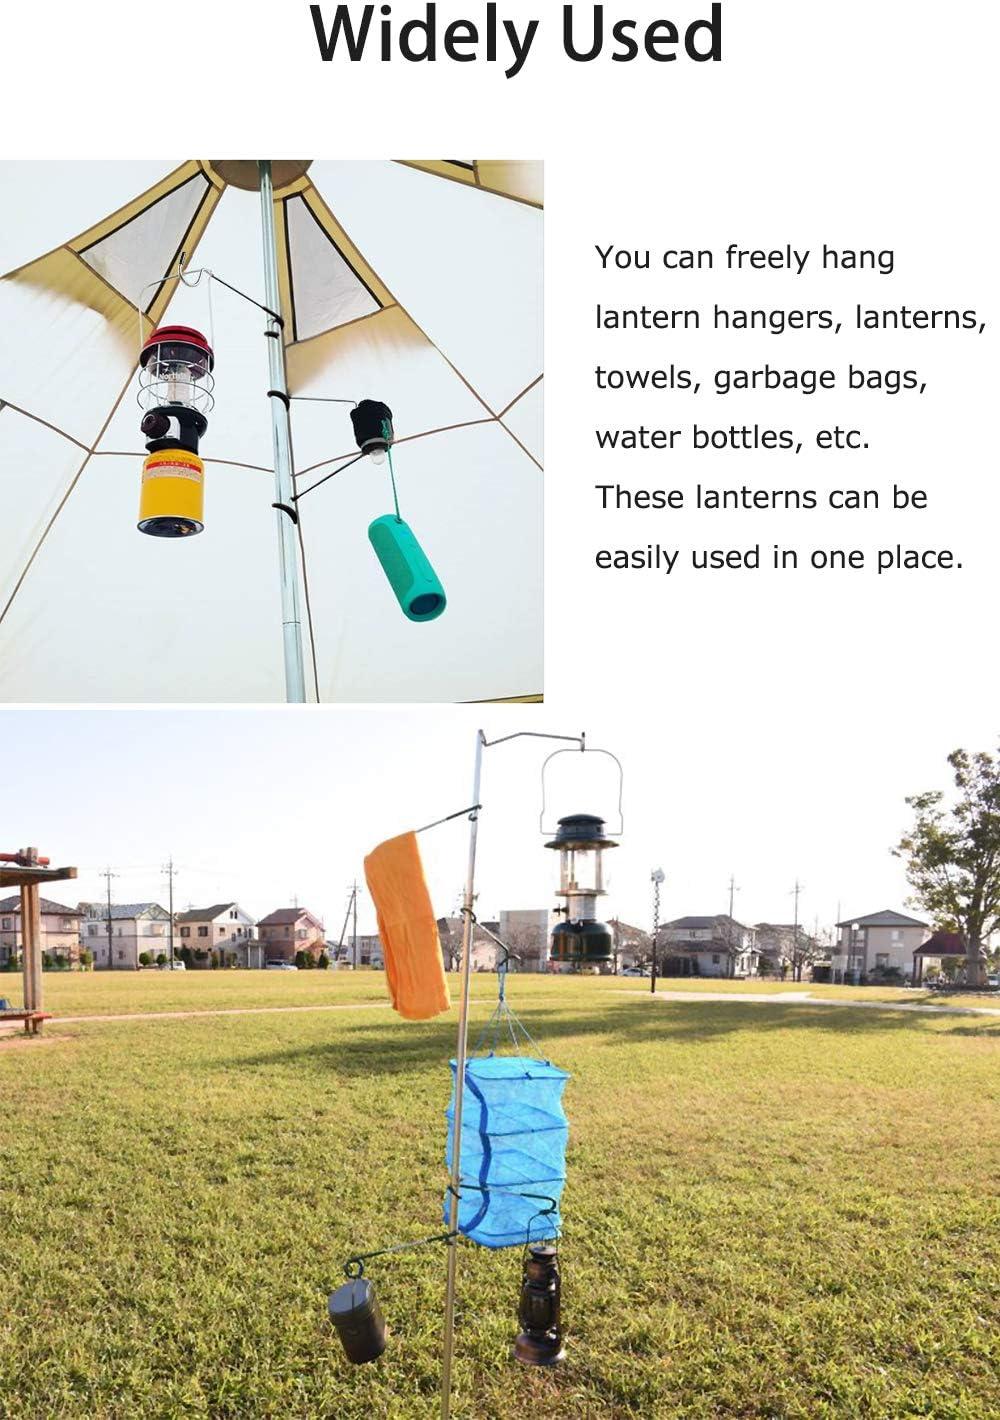 OMUKY Camping/Hook/Hanger Hook Lantern Lamp Hanger Tent Pole Post Hook Hanging for Camping Fishing